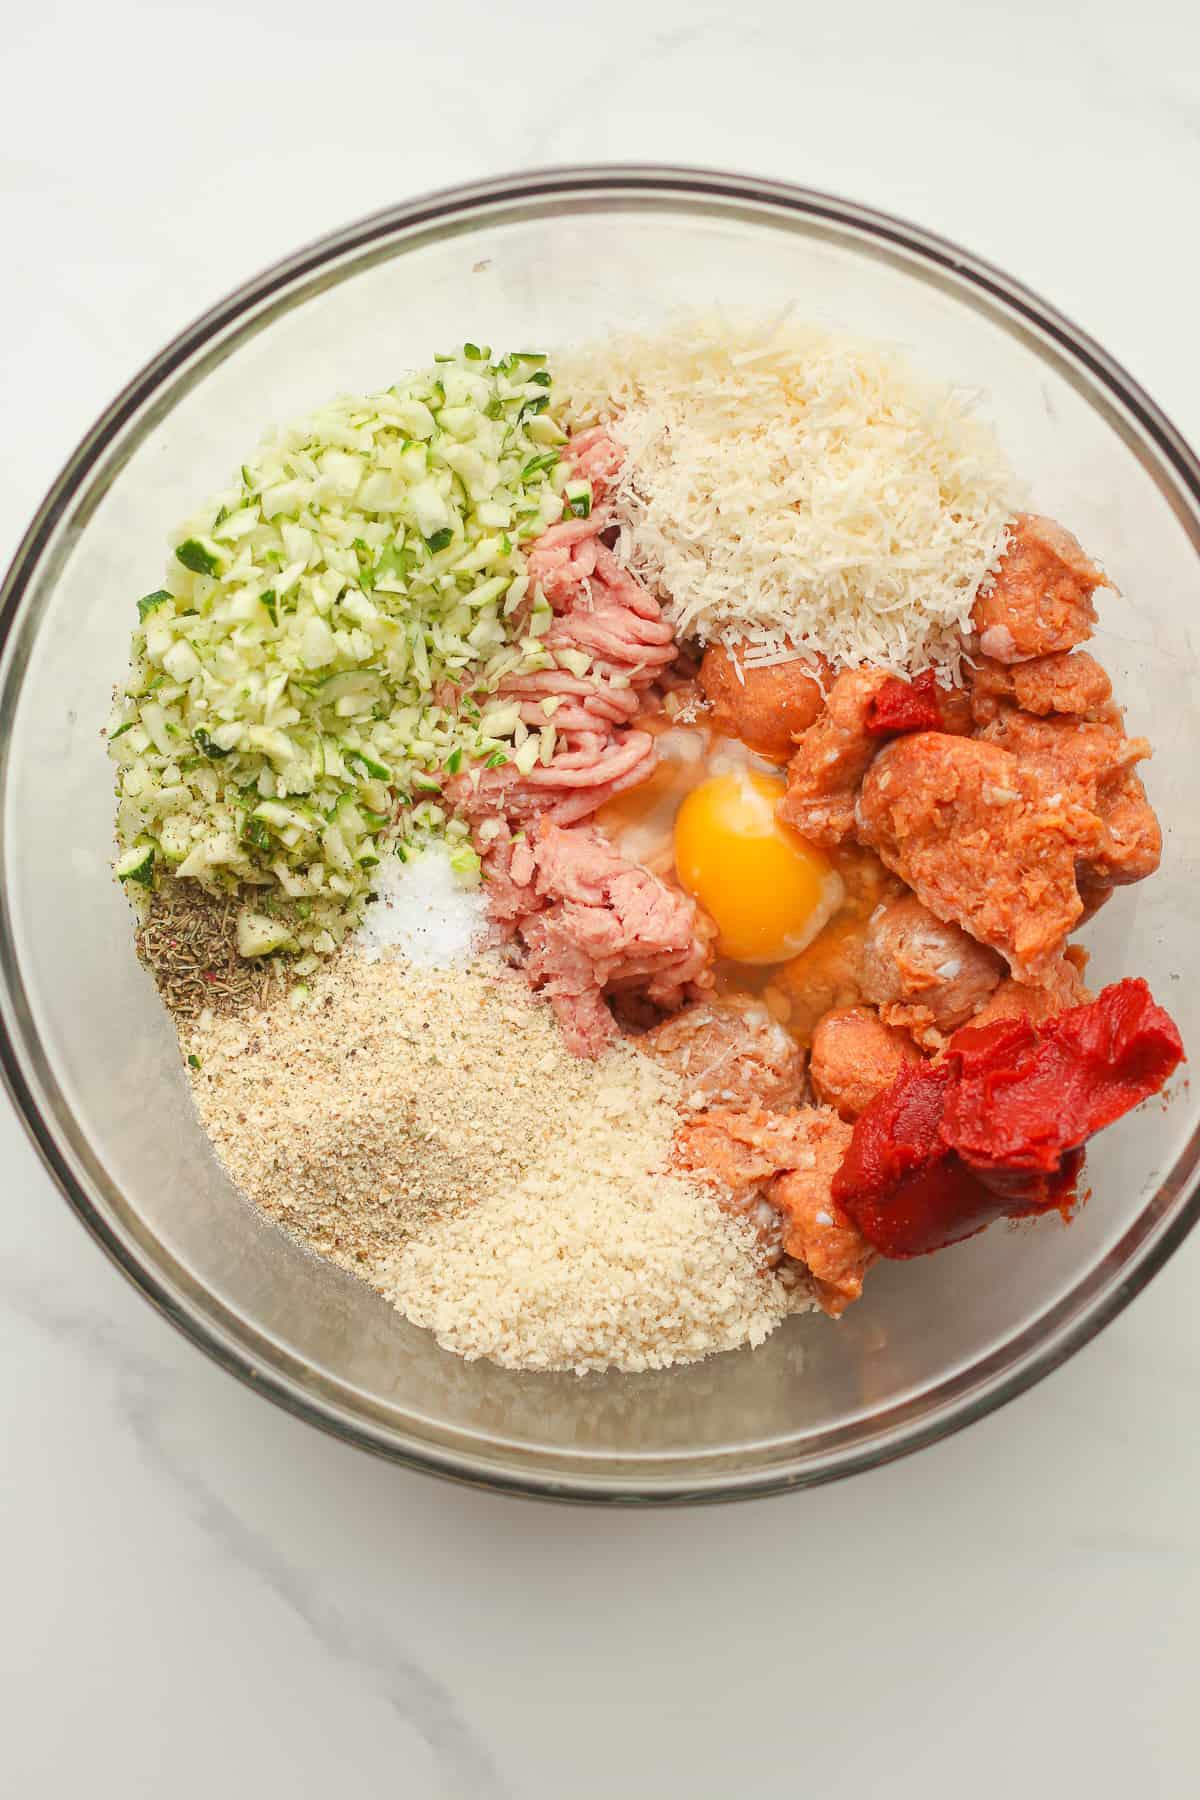 The turkey meatball ingredients.